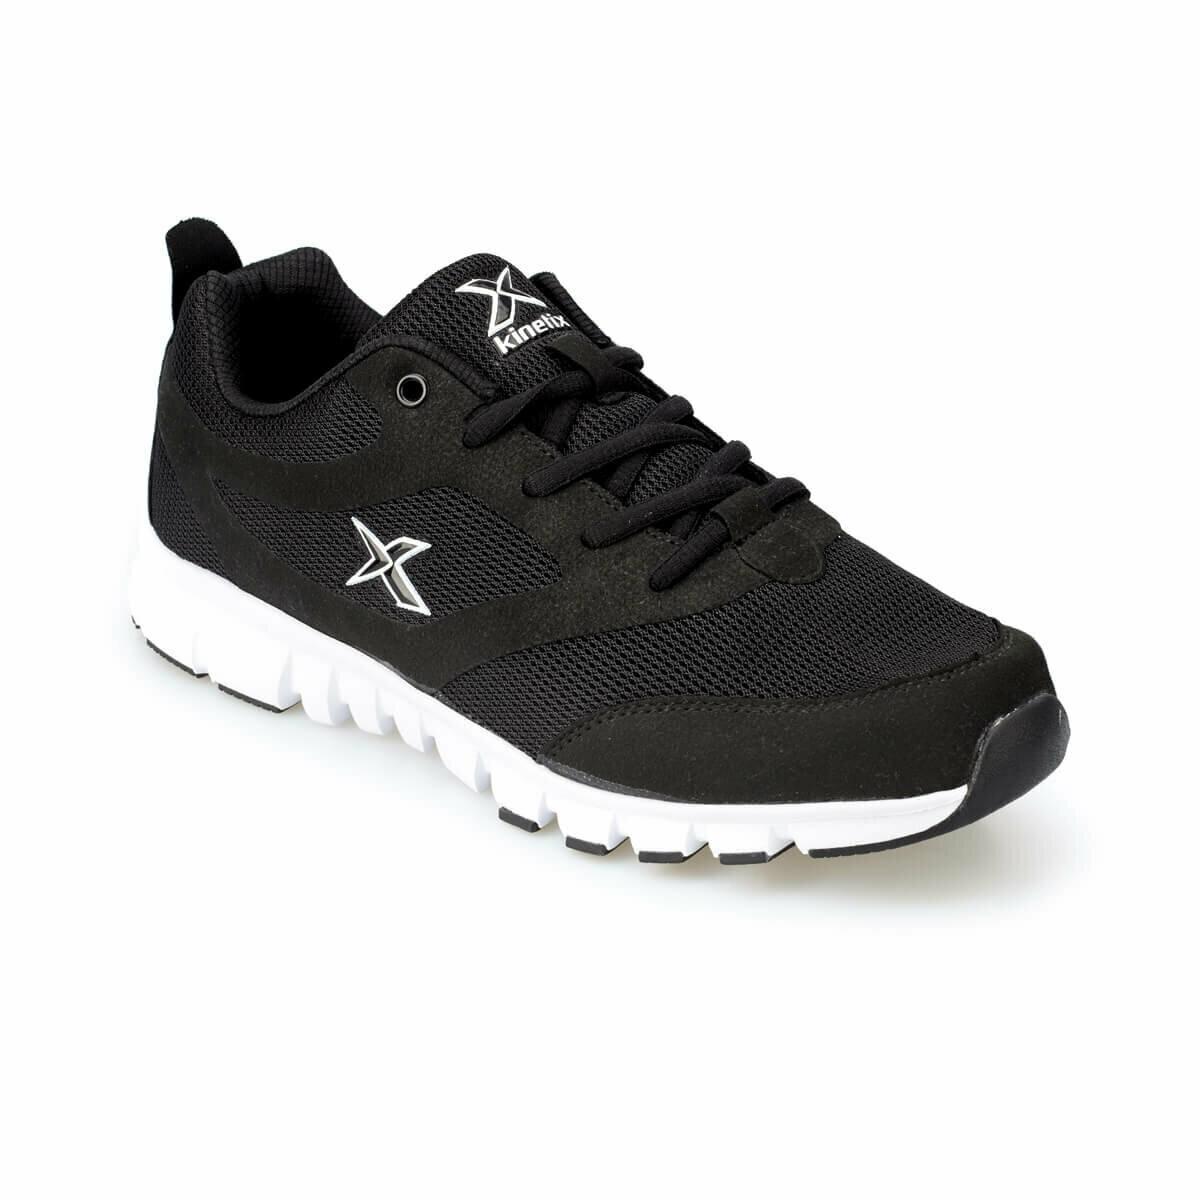 FLO ALMERA Black Men 'S Sneaker Shoes KINETIX